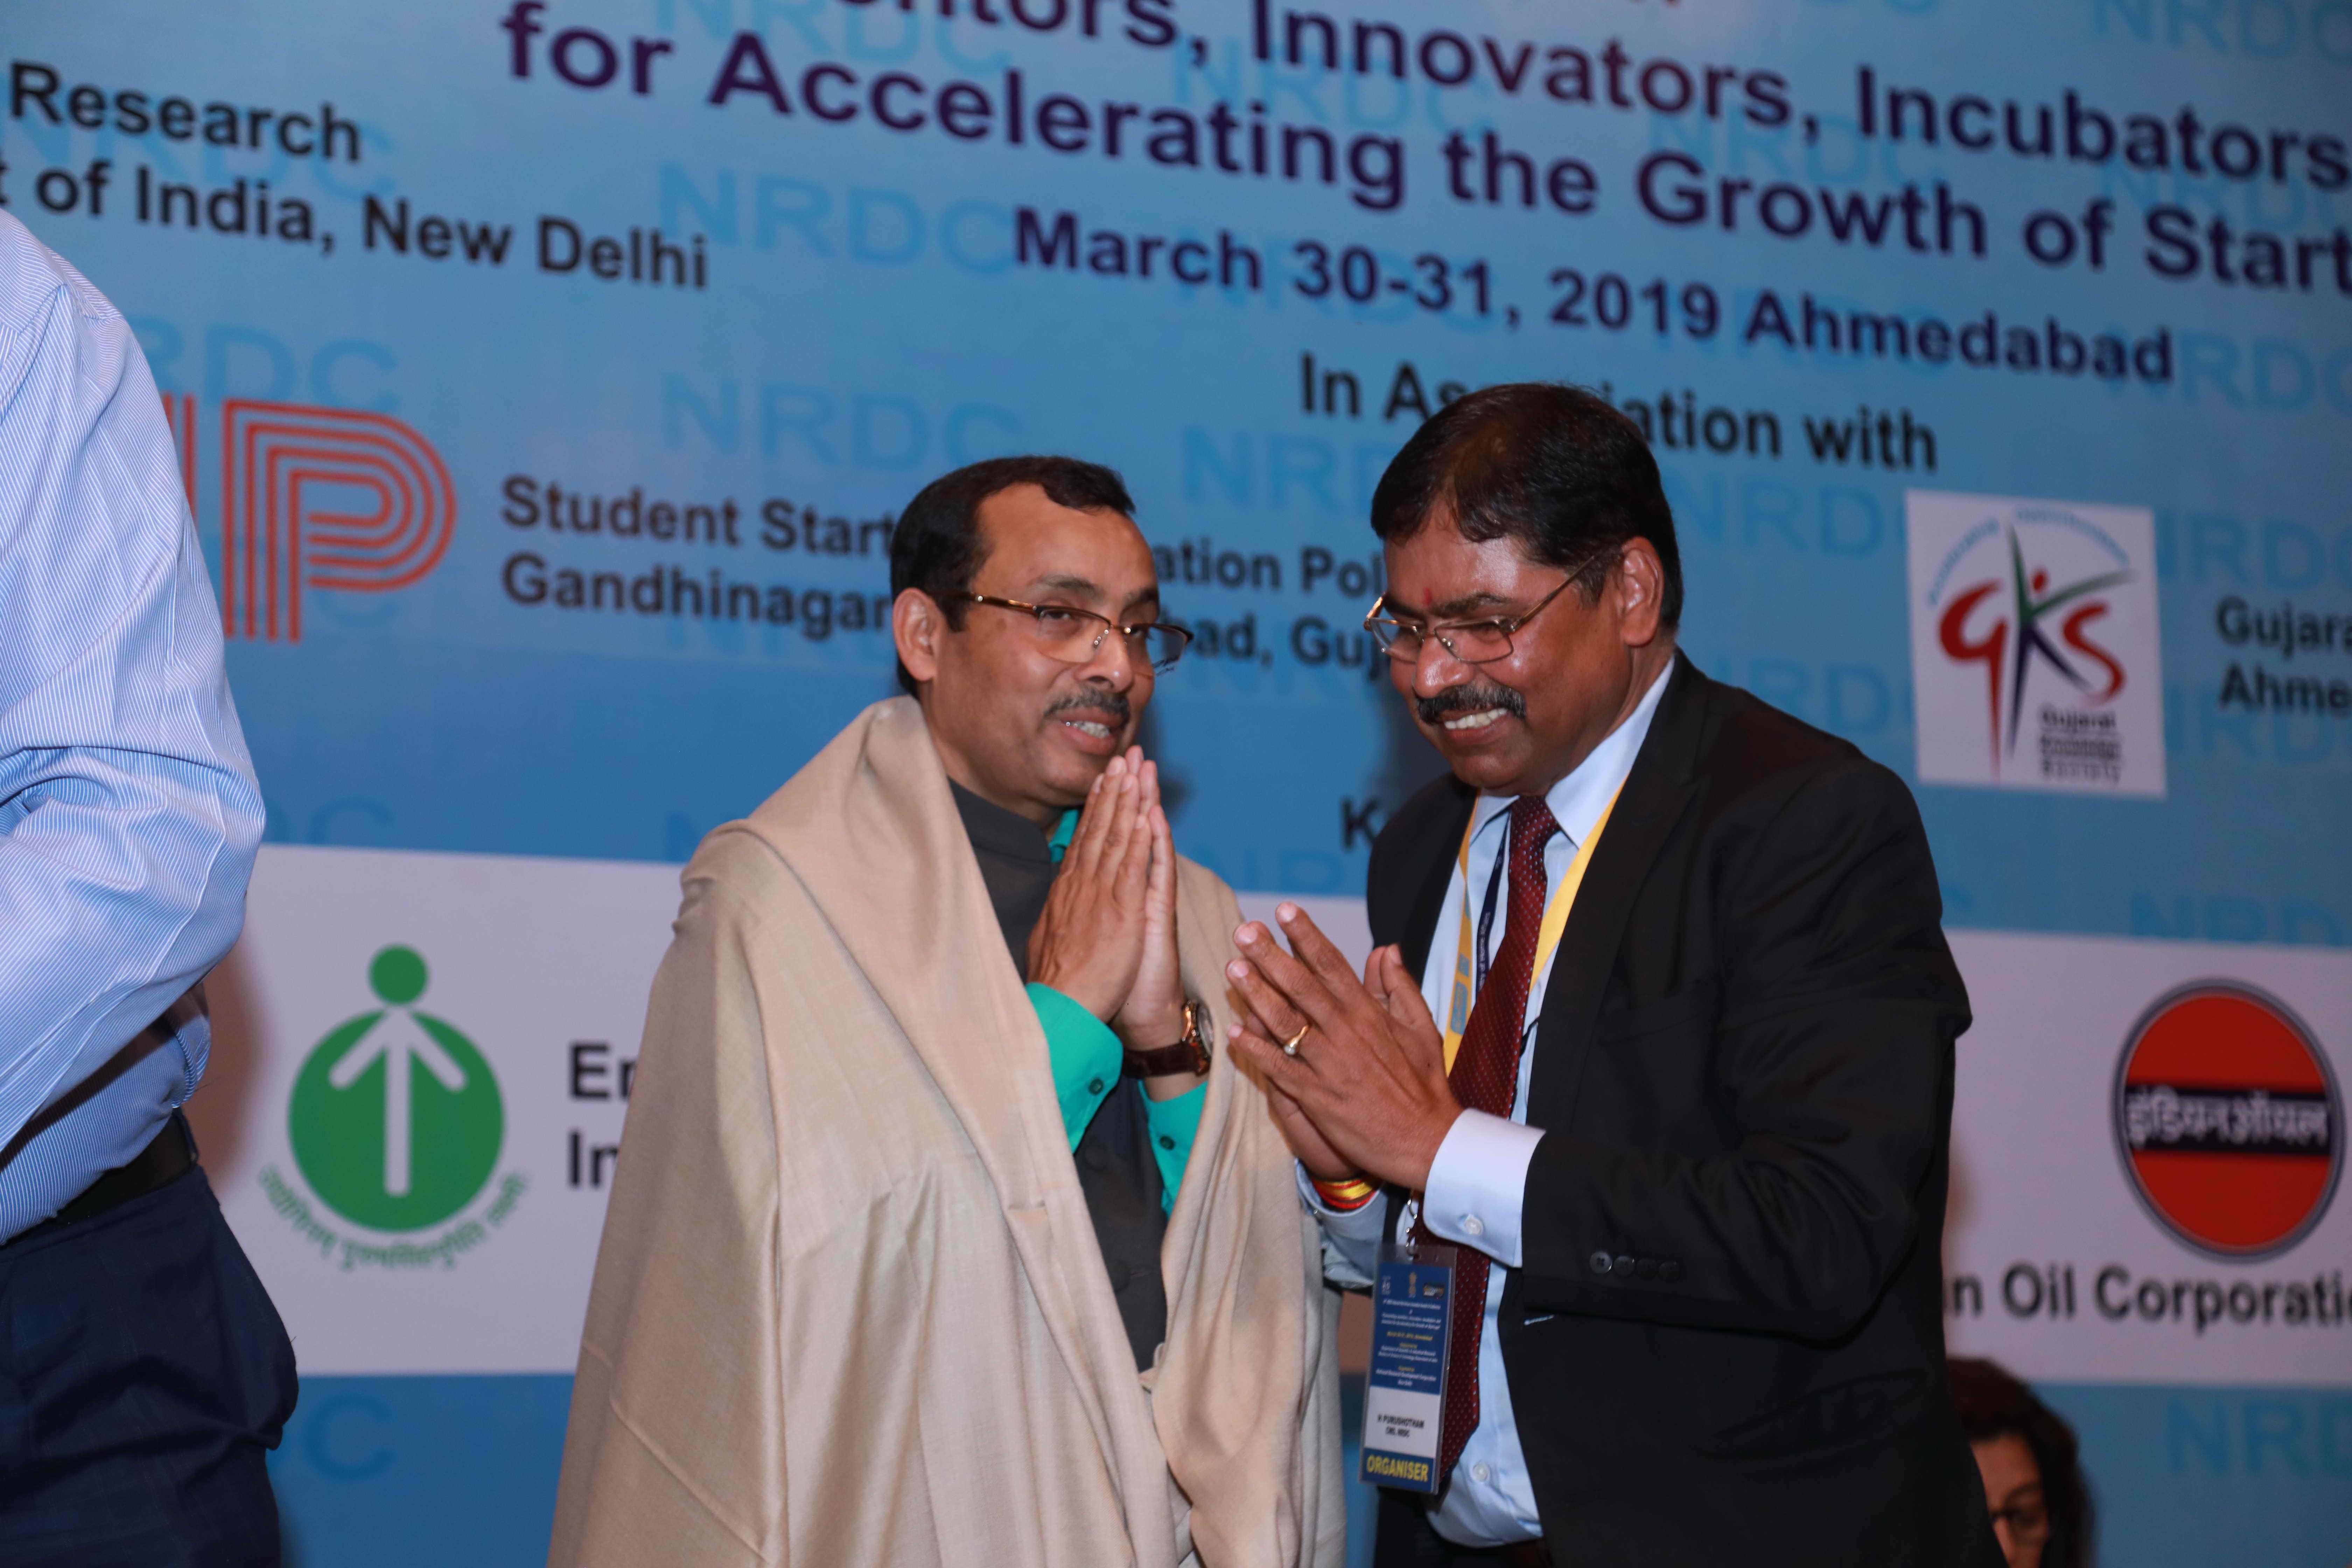 Innovate India 2019